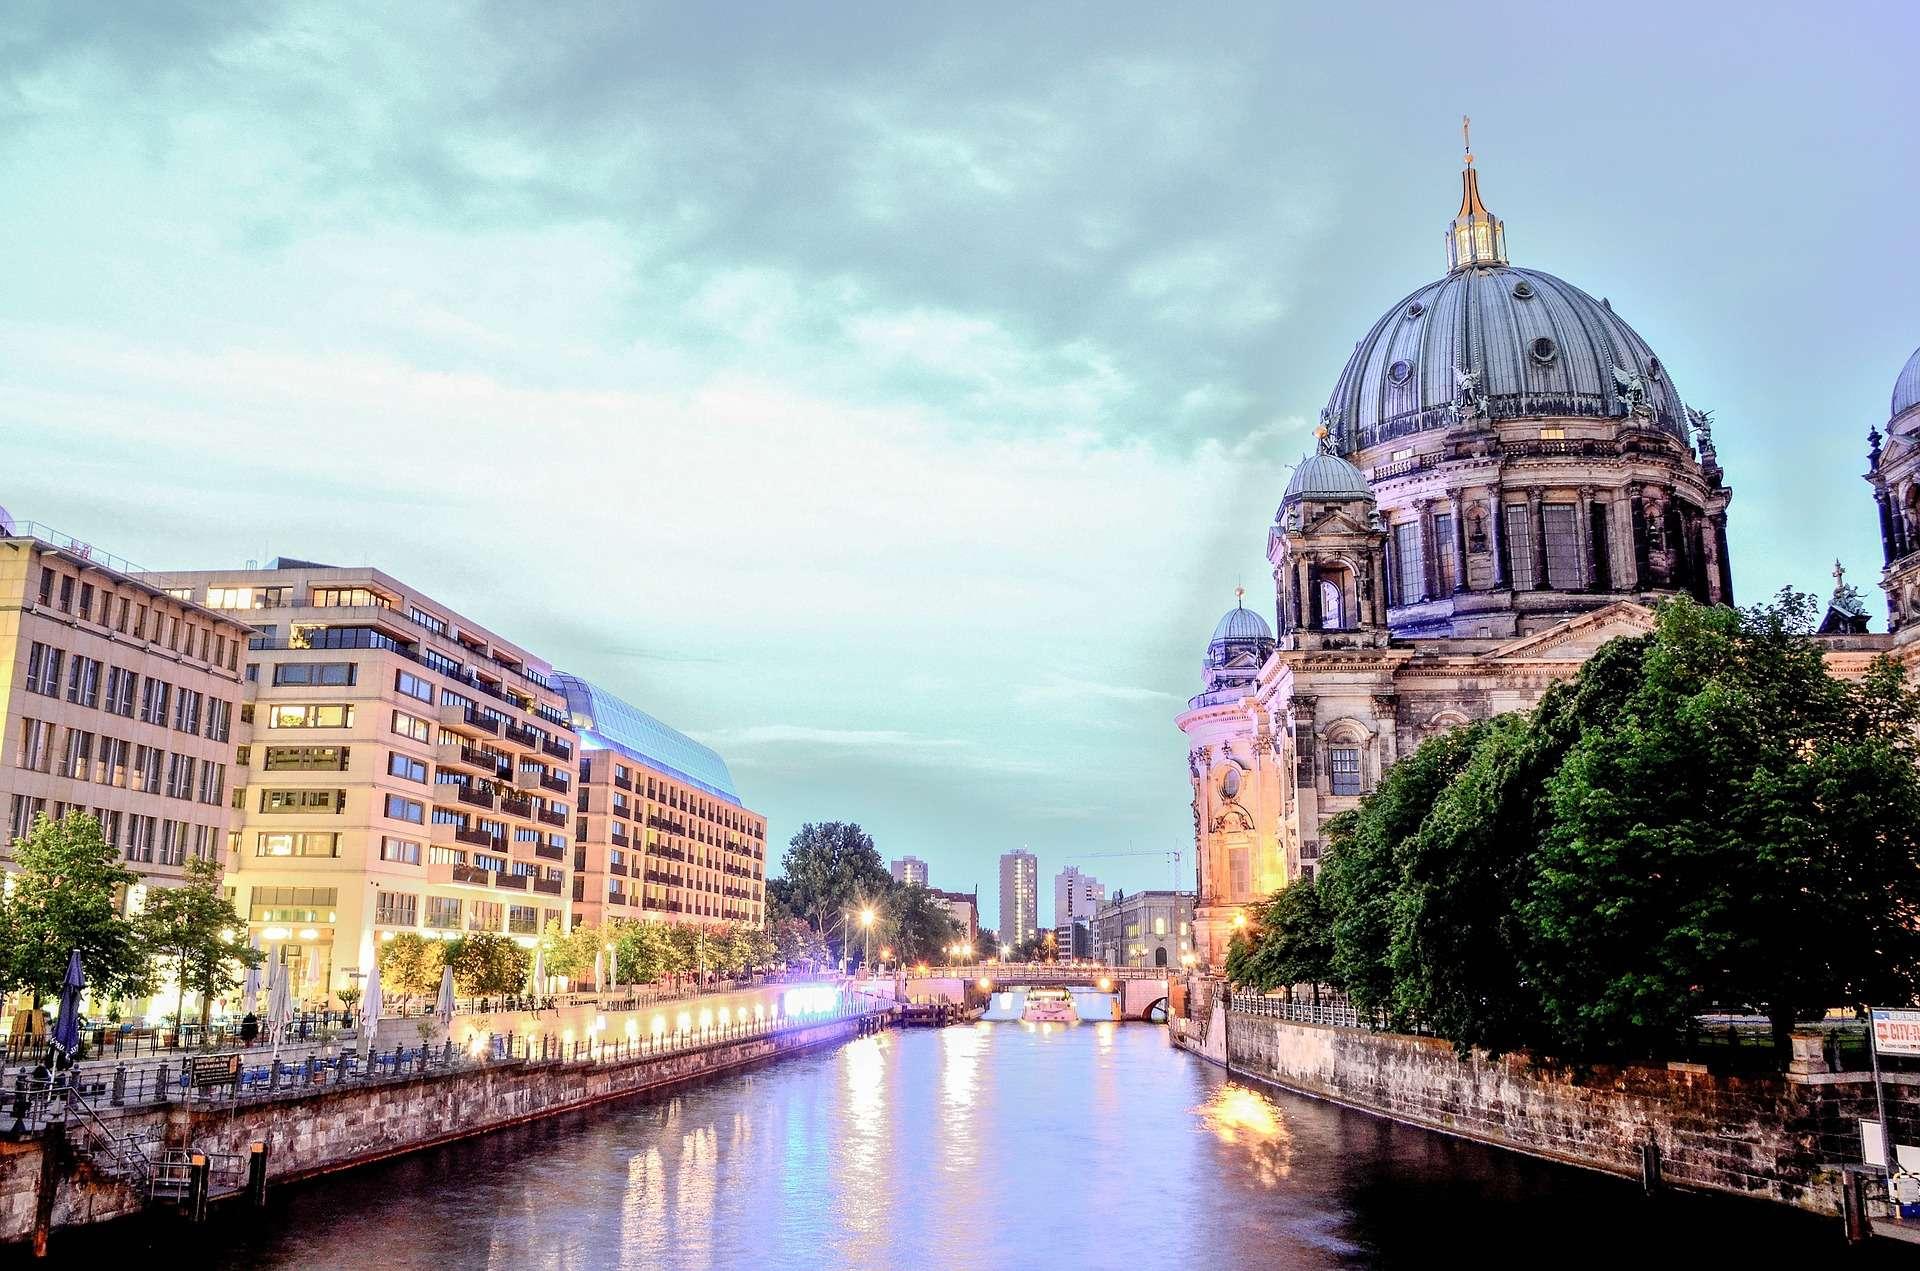 Direktflüge ab Basel nach Berlin-Schönefeld